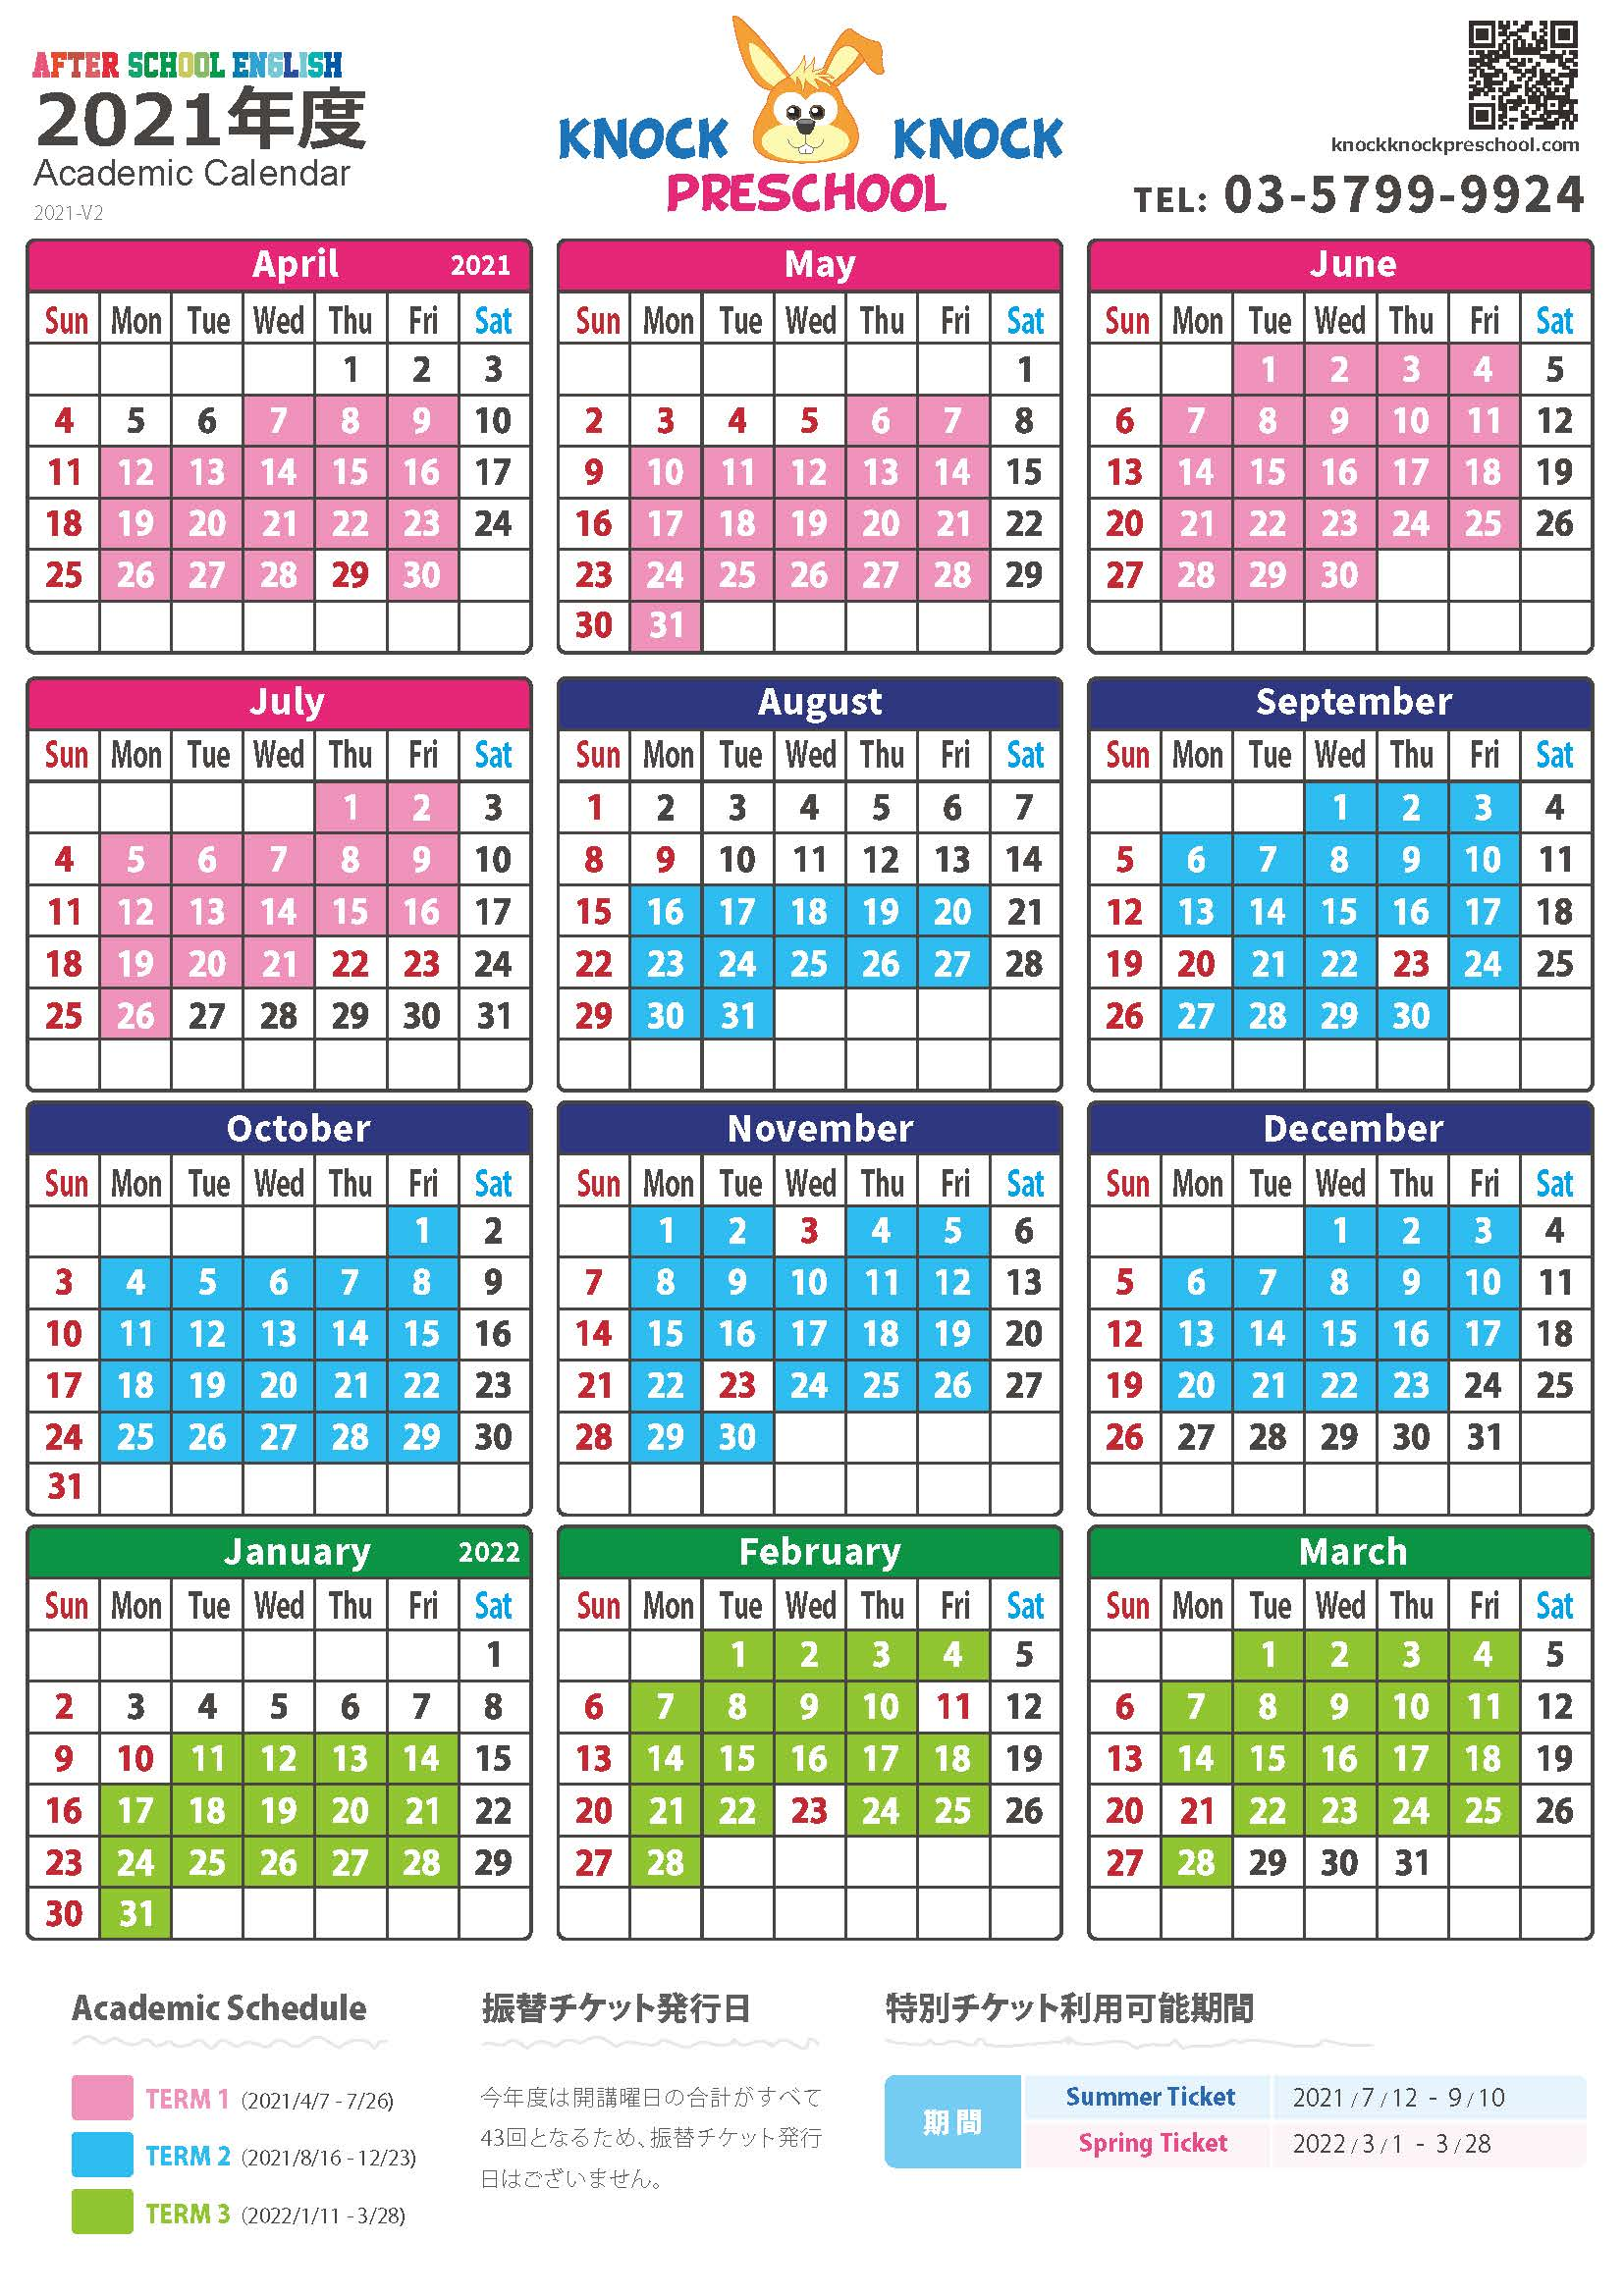 Ku Spring 2022 Calendar.2021 Yearly Academic Schedule 3 Terms